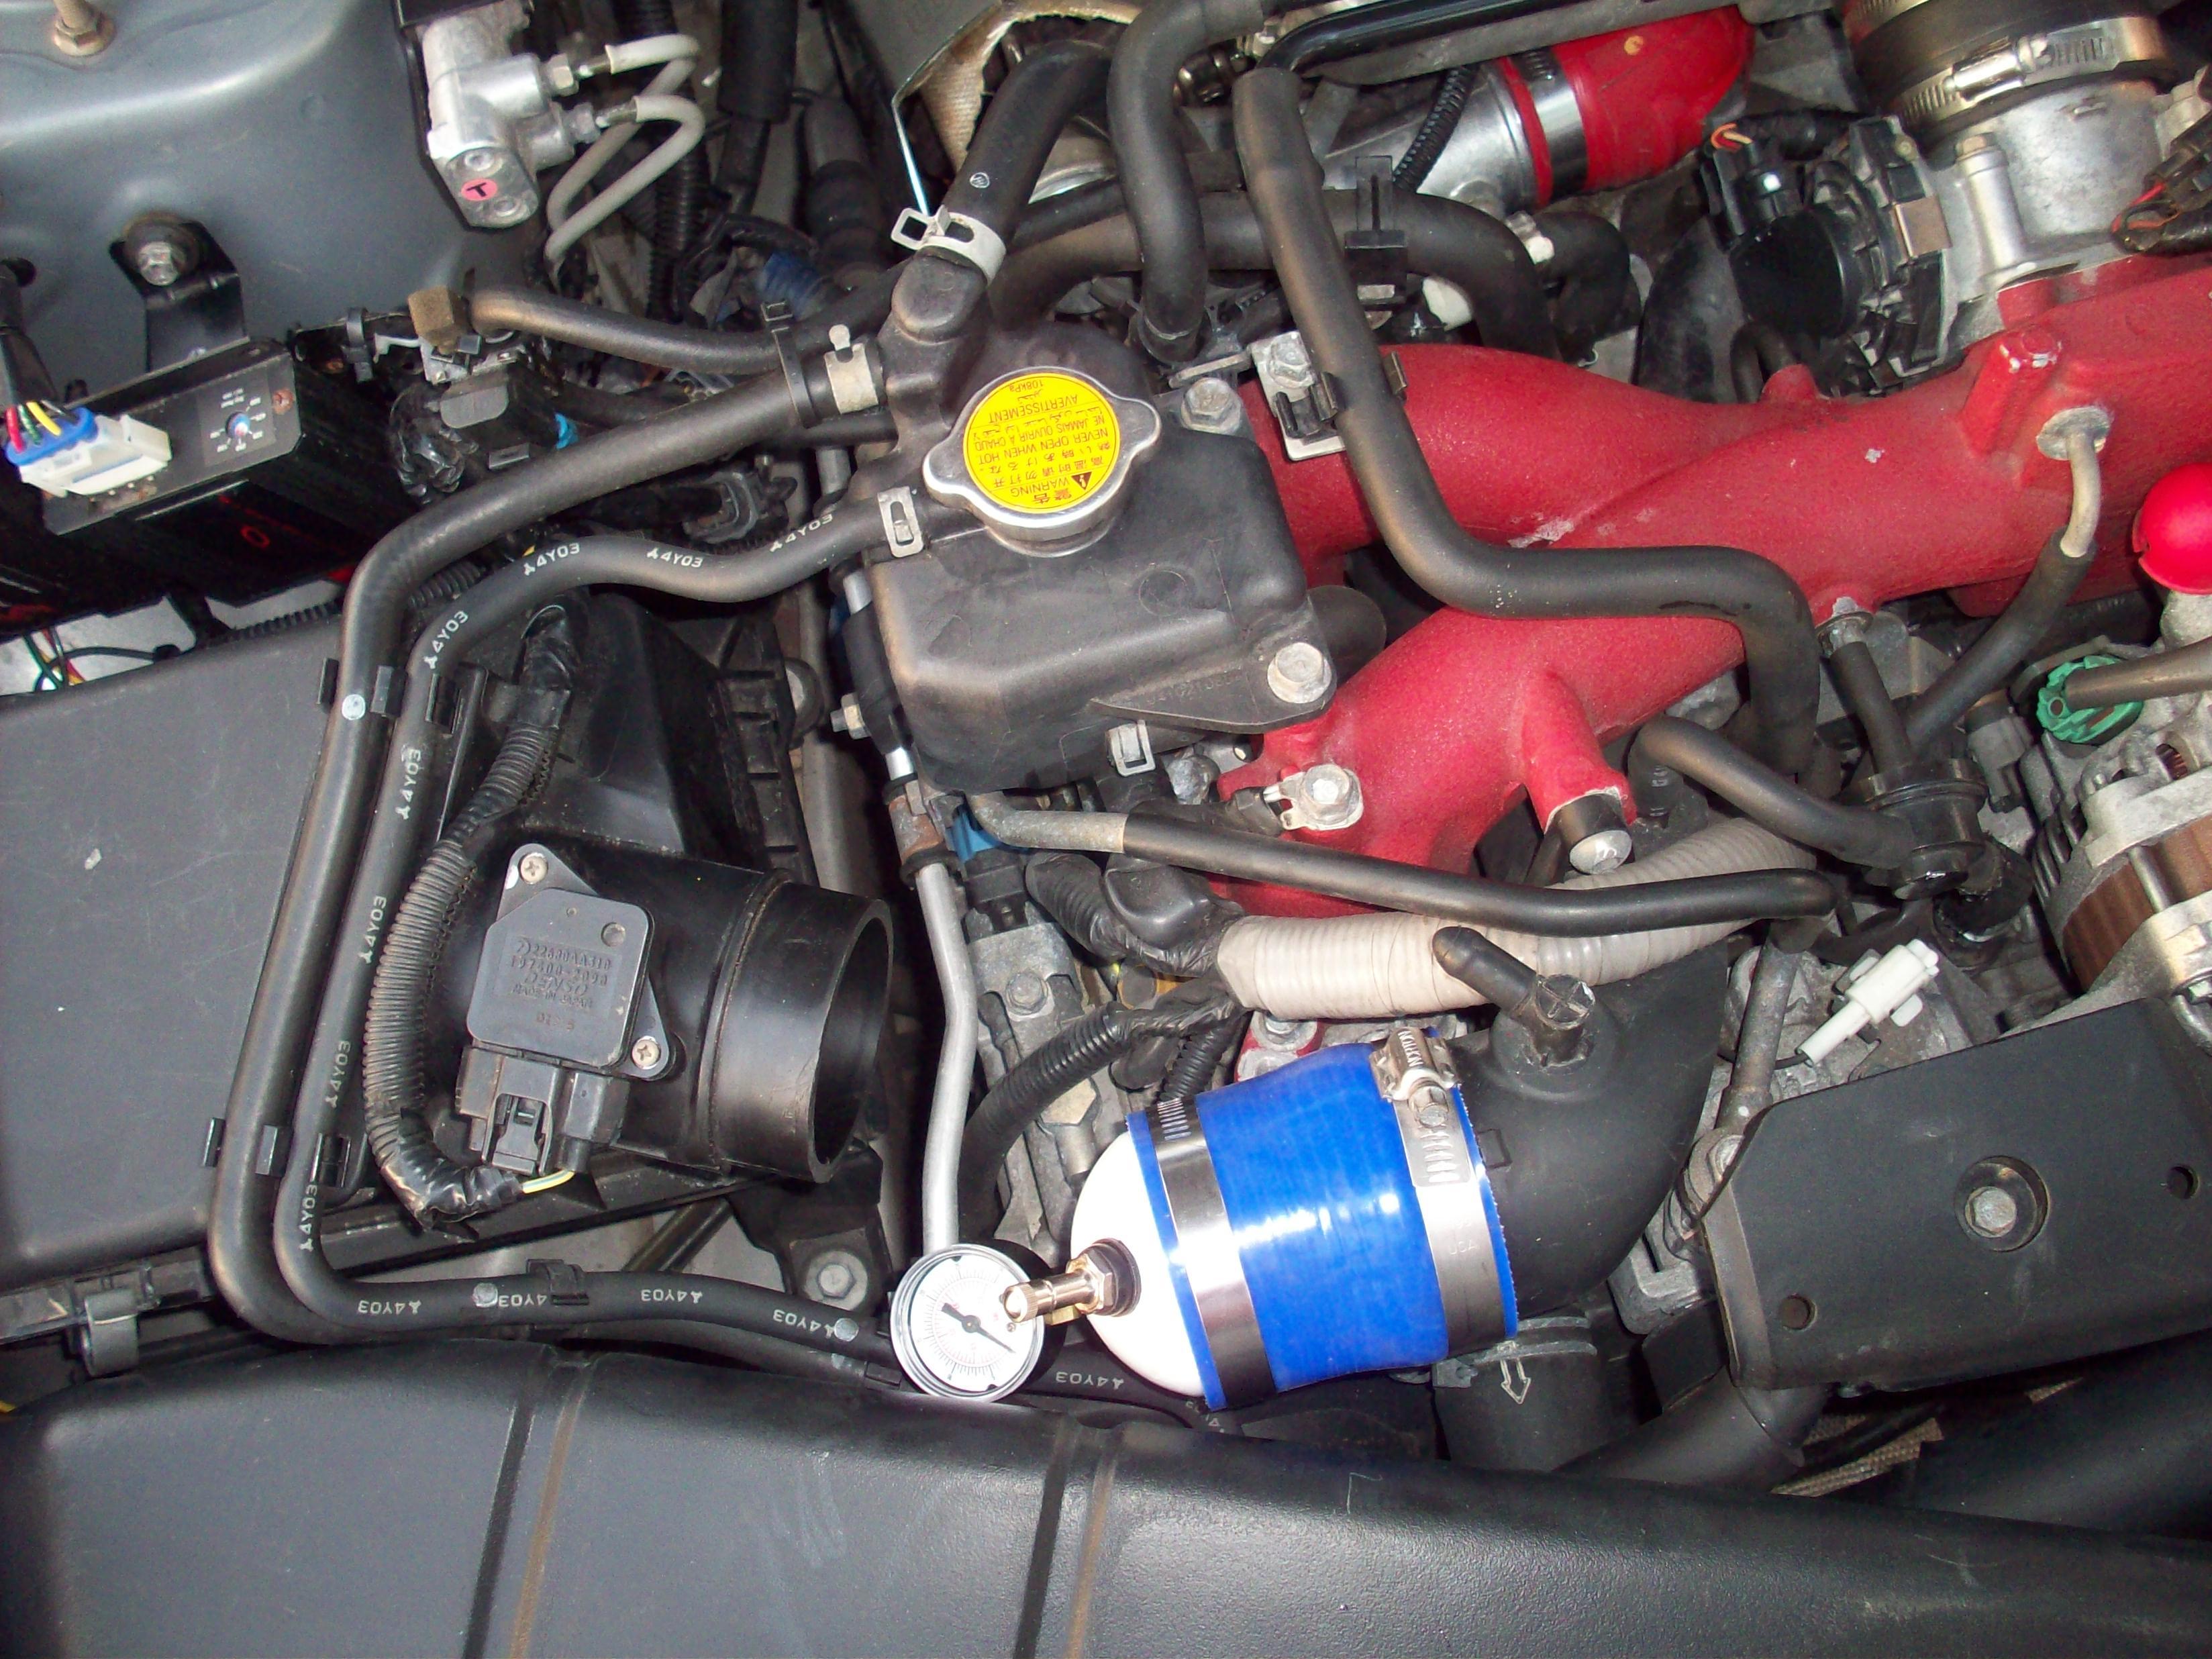 subaru2?t=1422674539 how to boostleak test a subaru Subaru Firing Order Diagram at gsmx.co